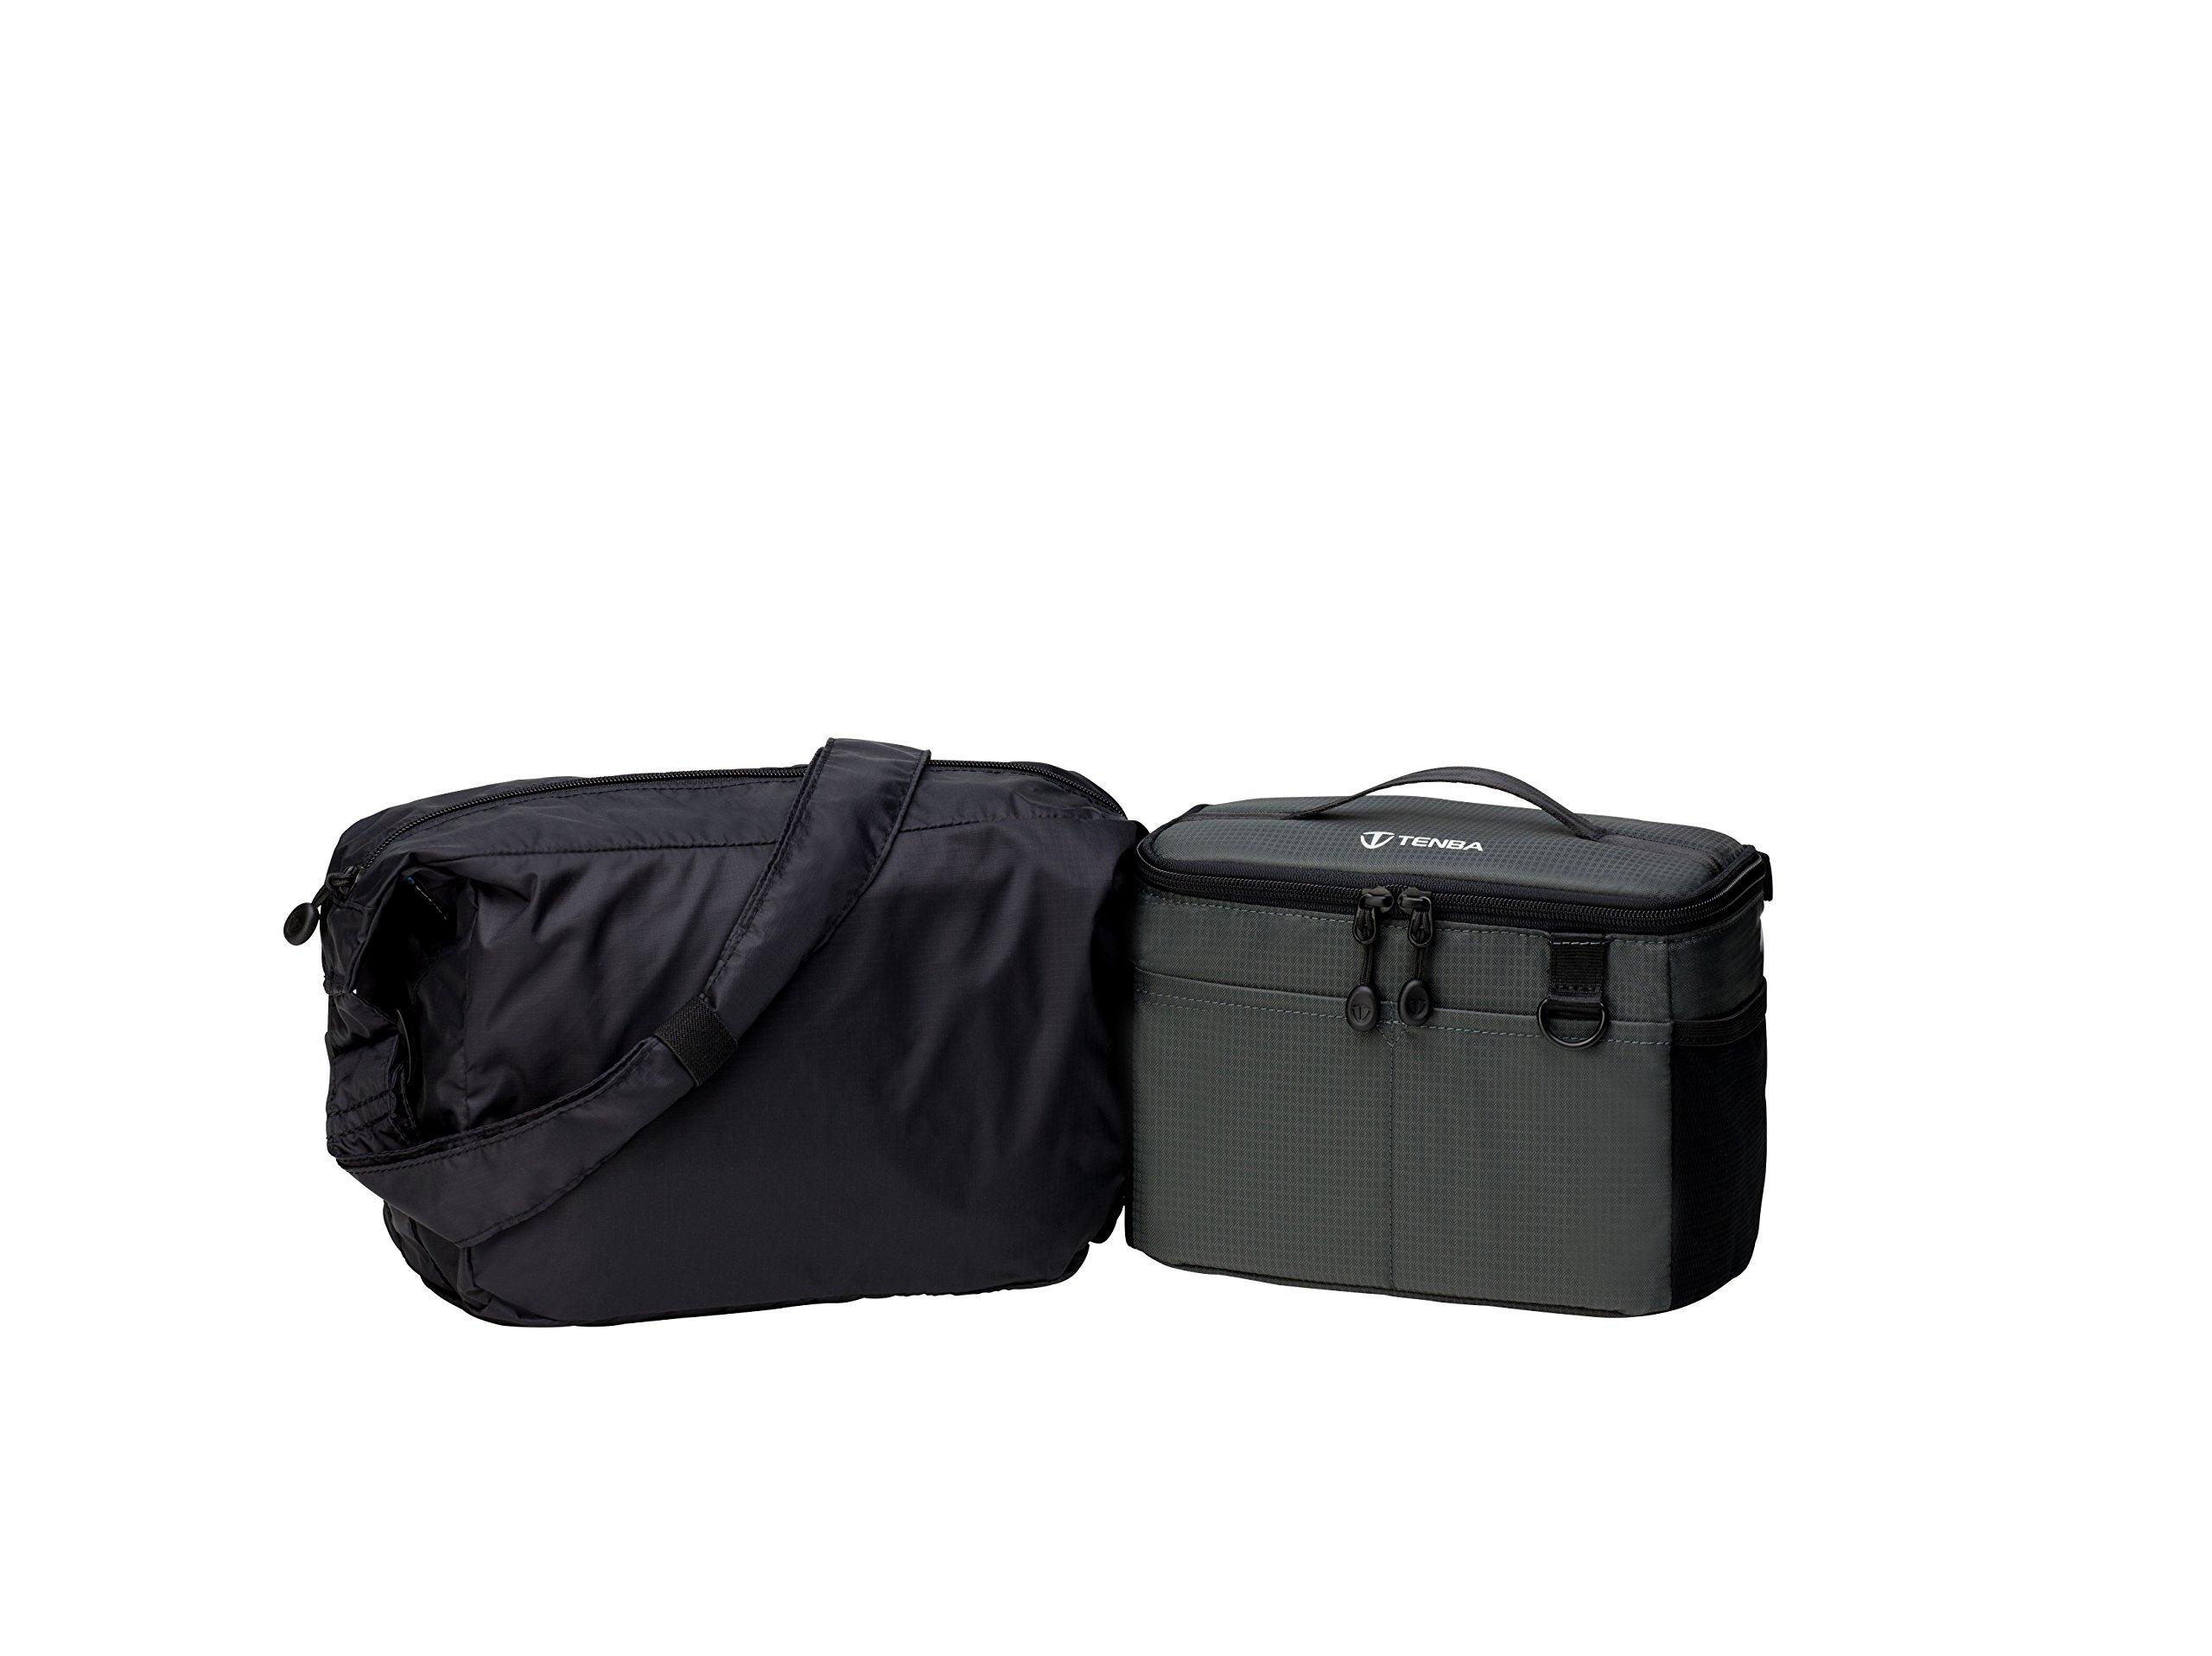 Tenba BYOB/Packlite 9 Flatpack Bundle with Insert and Packlite Bag (636-282) by Tenba